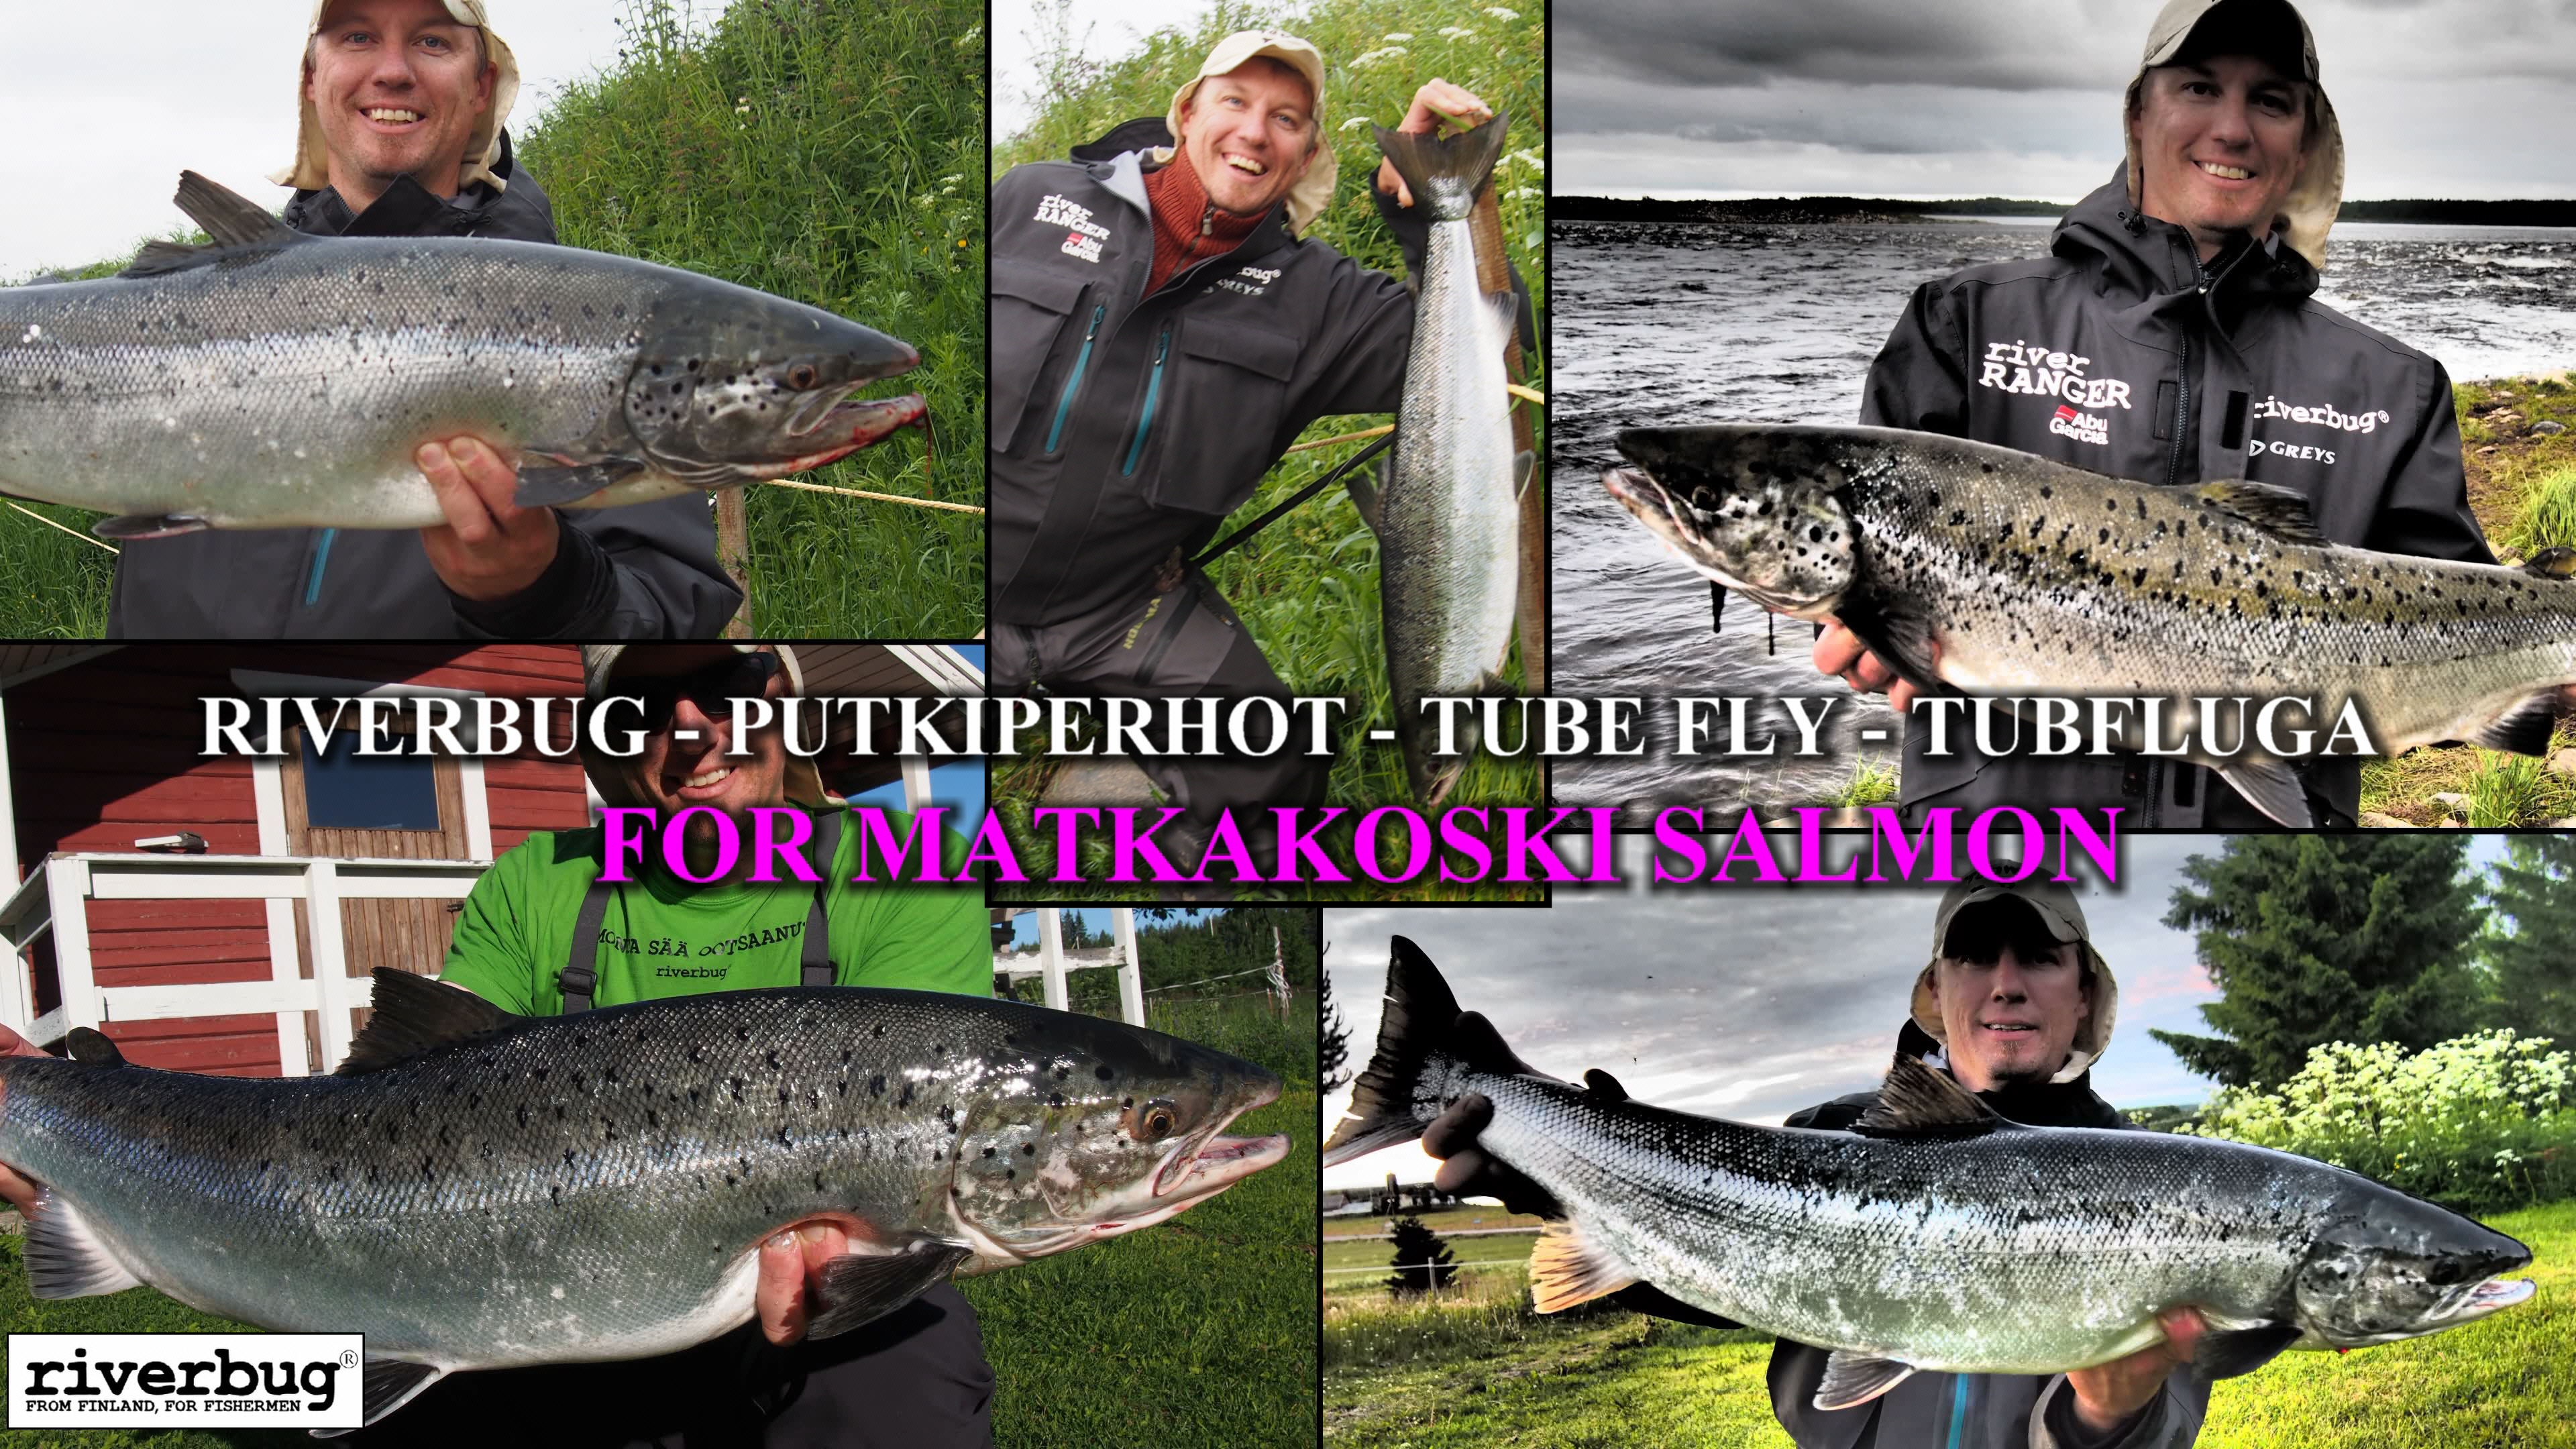 Season 2019 were the best ever for RiverBug Tube flies in Matkakoski. Here´s some test results by River Ranger. #matkakoski #lohi #riverbug #putkiperhot #perhonsidonta #merikoski #boden #rivertube #merikoski #oulu